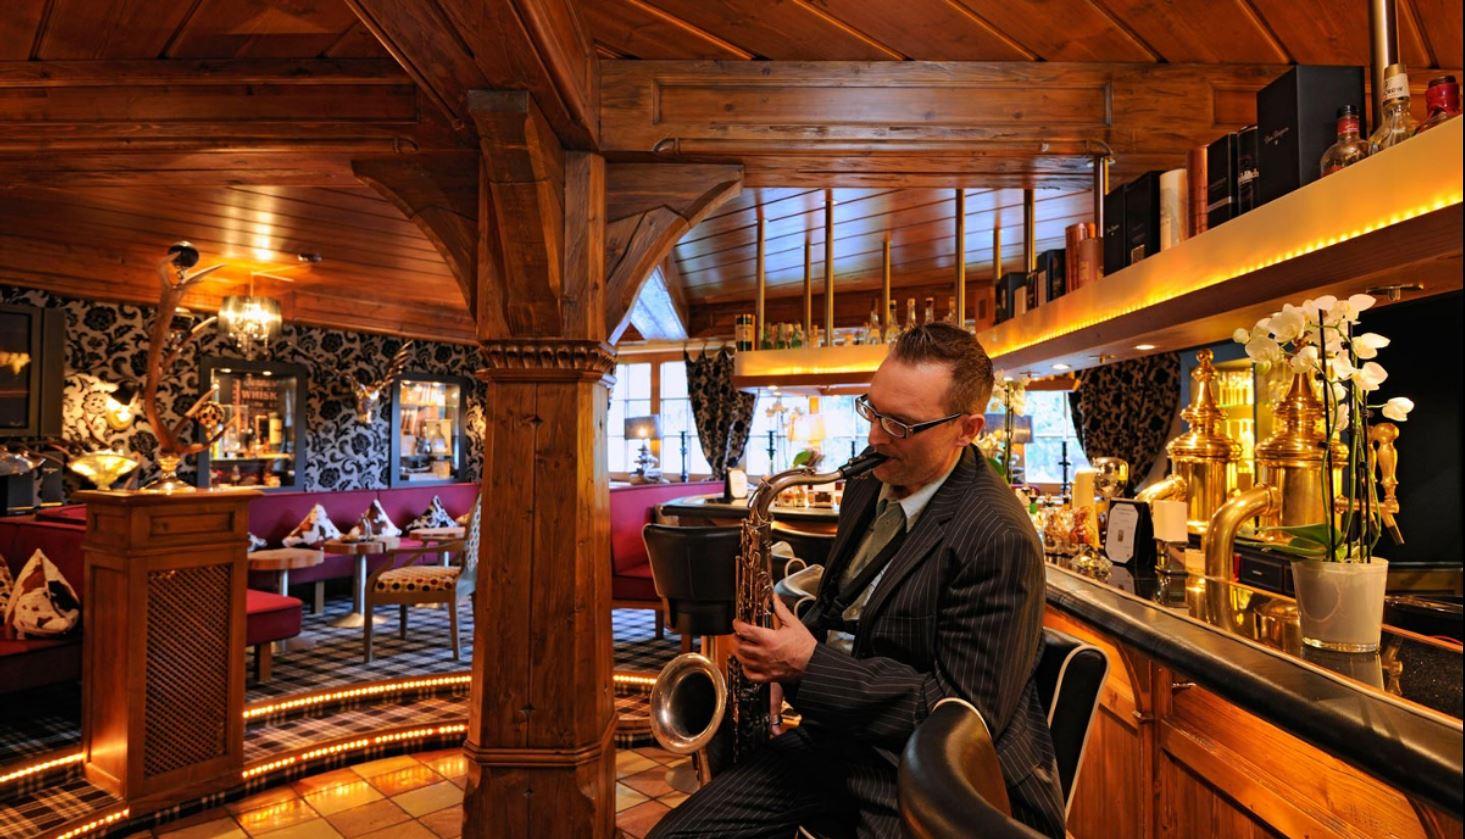 Piano-Bar-Hotel-Jagdhof-Glashütte